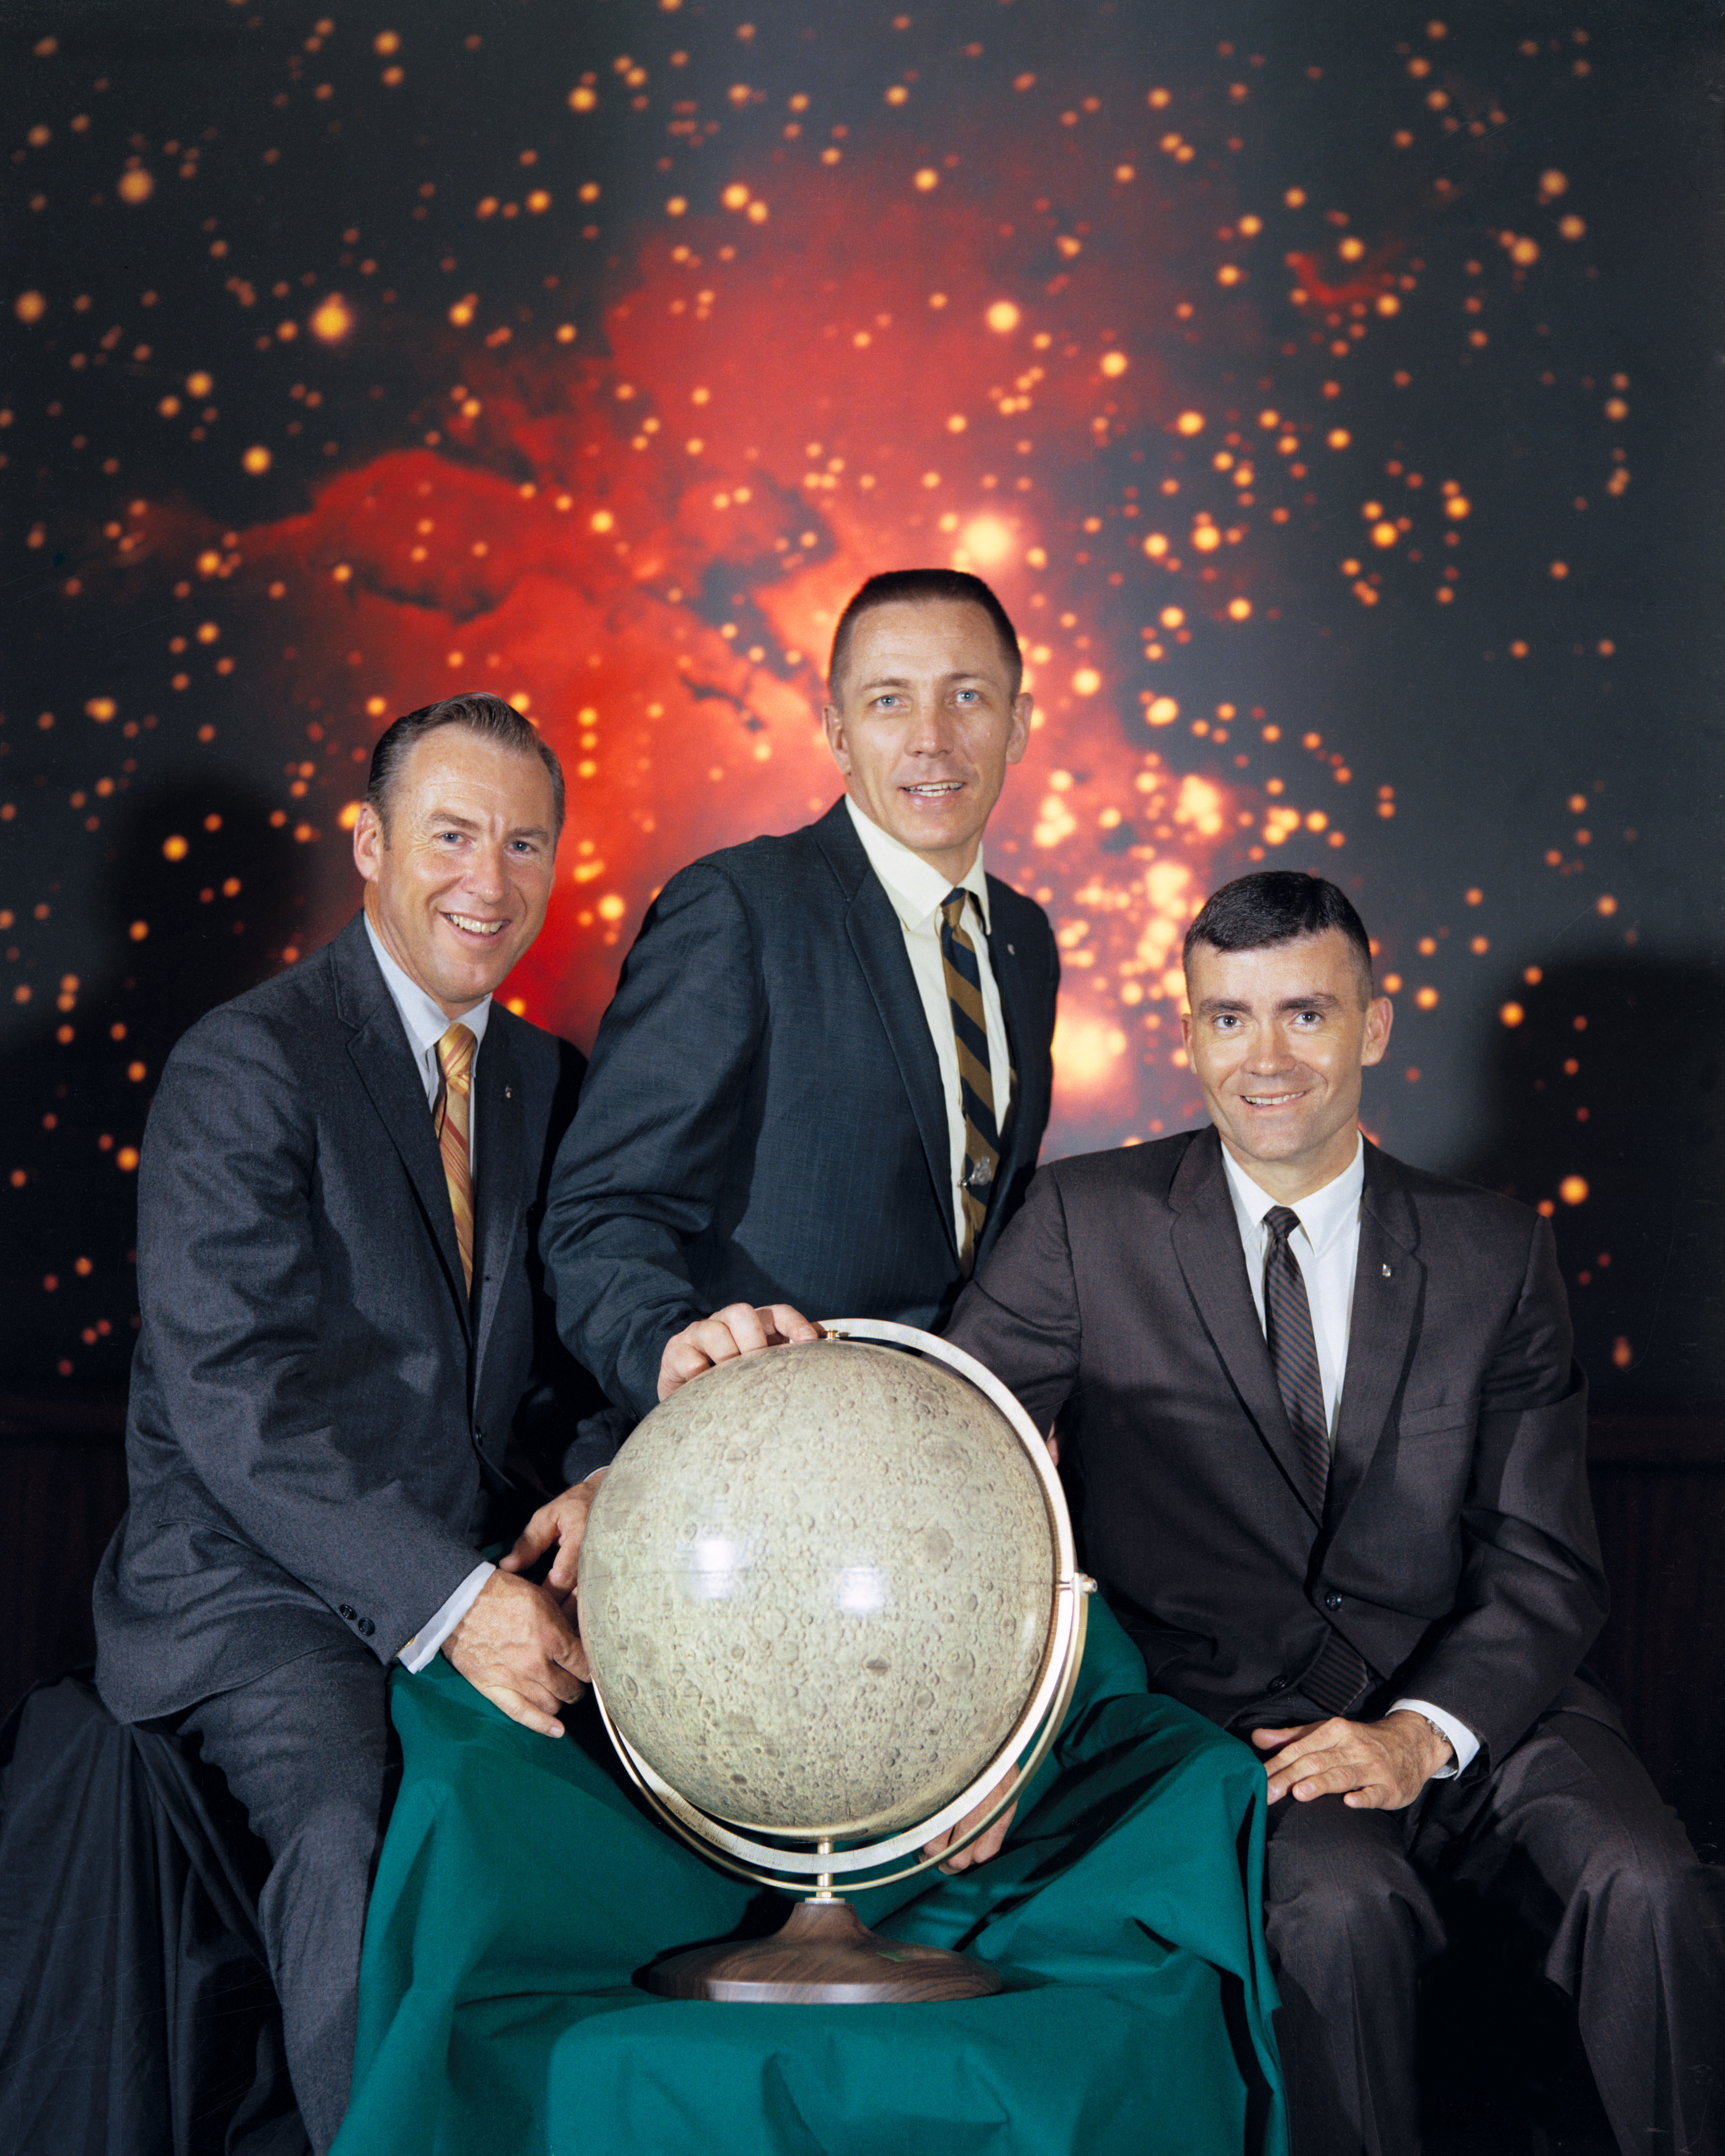 http://upload.wikimedia.org/wikipedia/commons/9/9b/The_Actual_Apollo_13_Prime_Crew_-_GPN-2000-001167.jpg